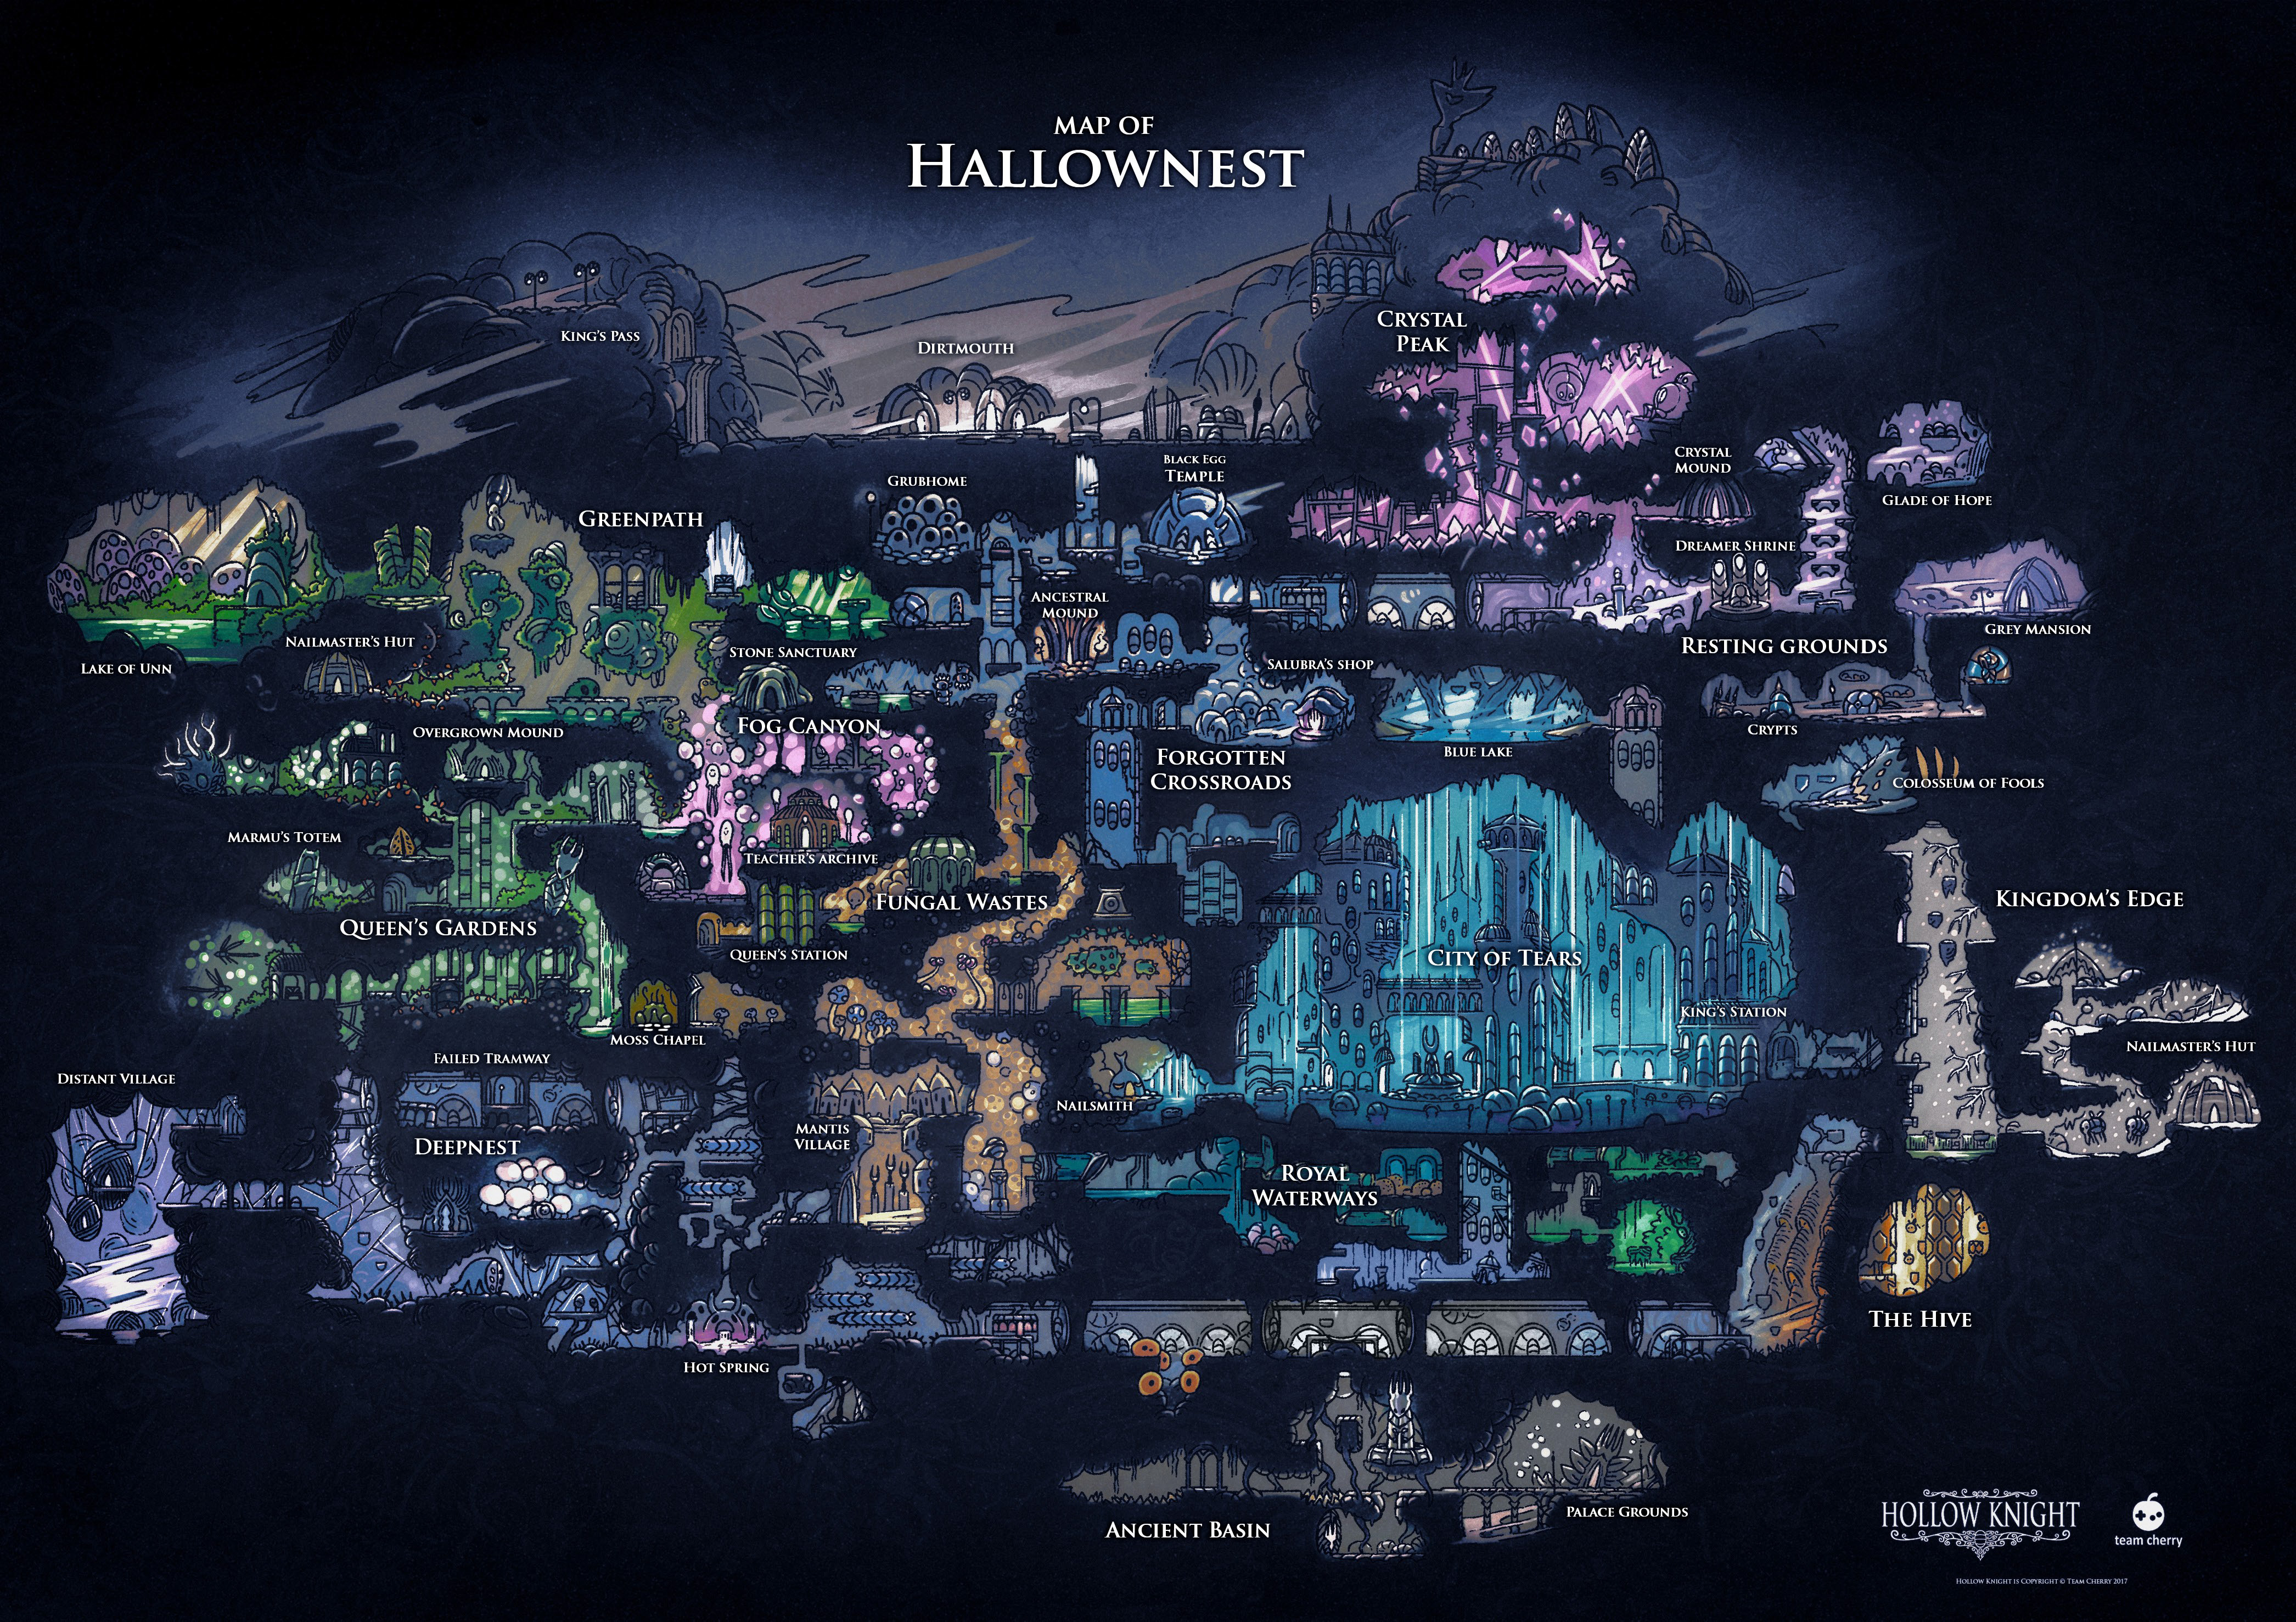 Hallownest